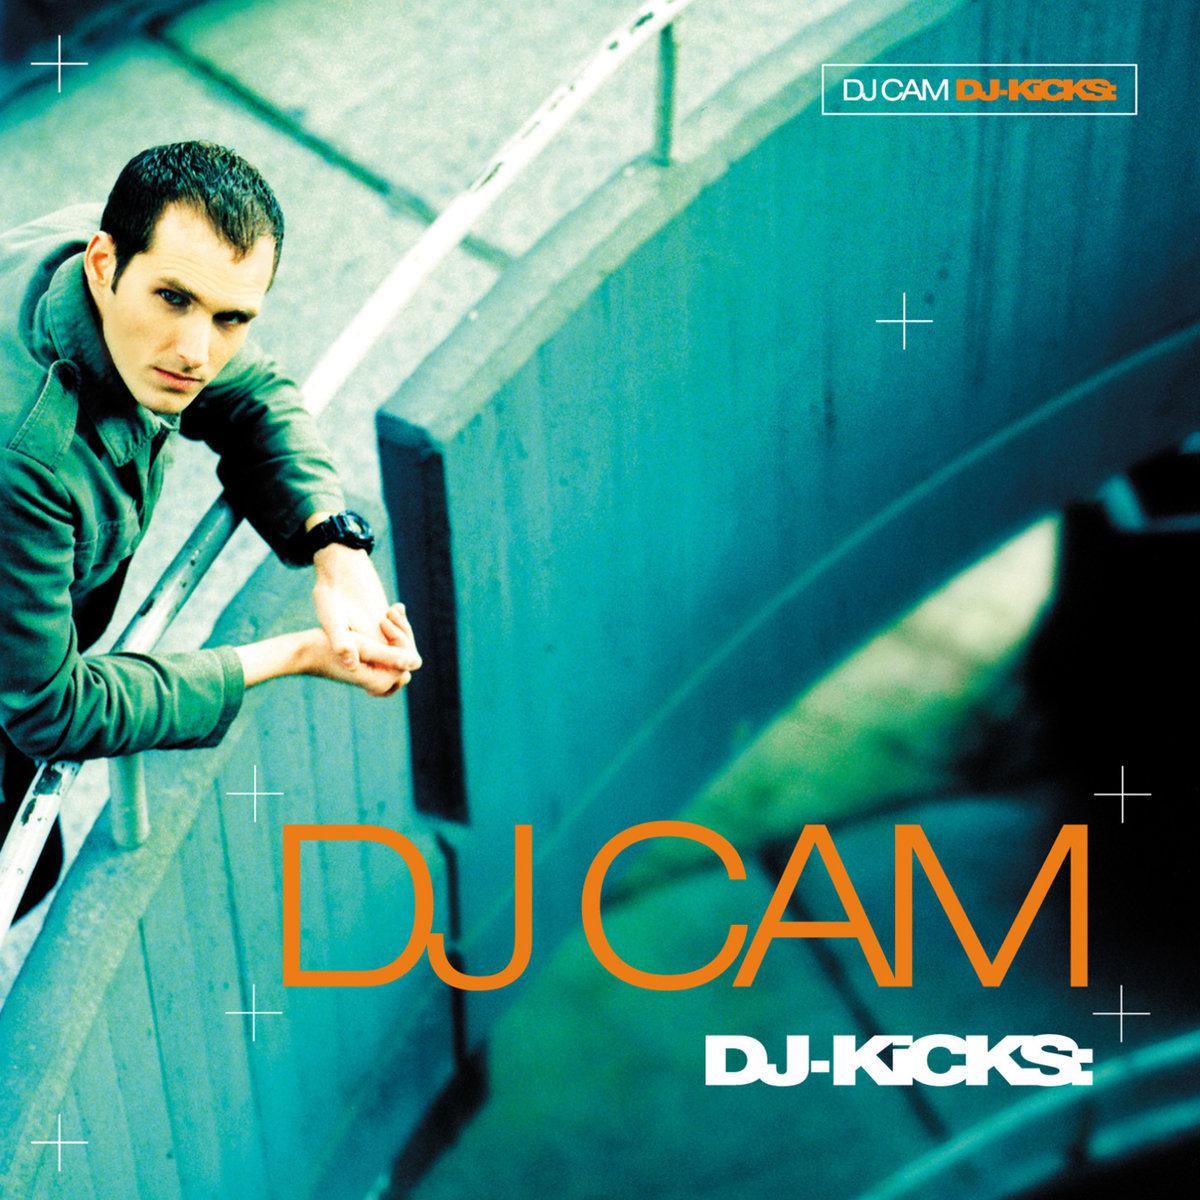 All Things Fair Full Movie Download dj-kicks (dj cam) | !k7 records